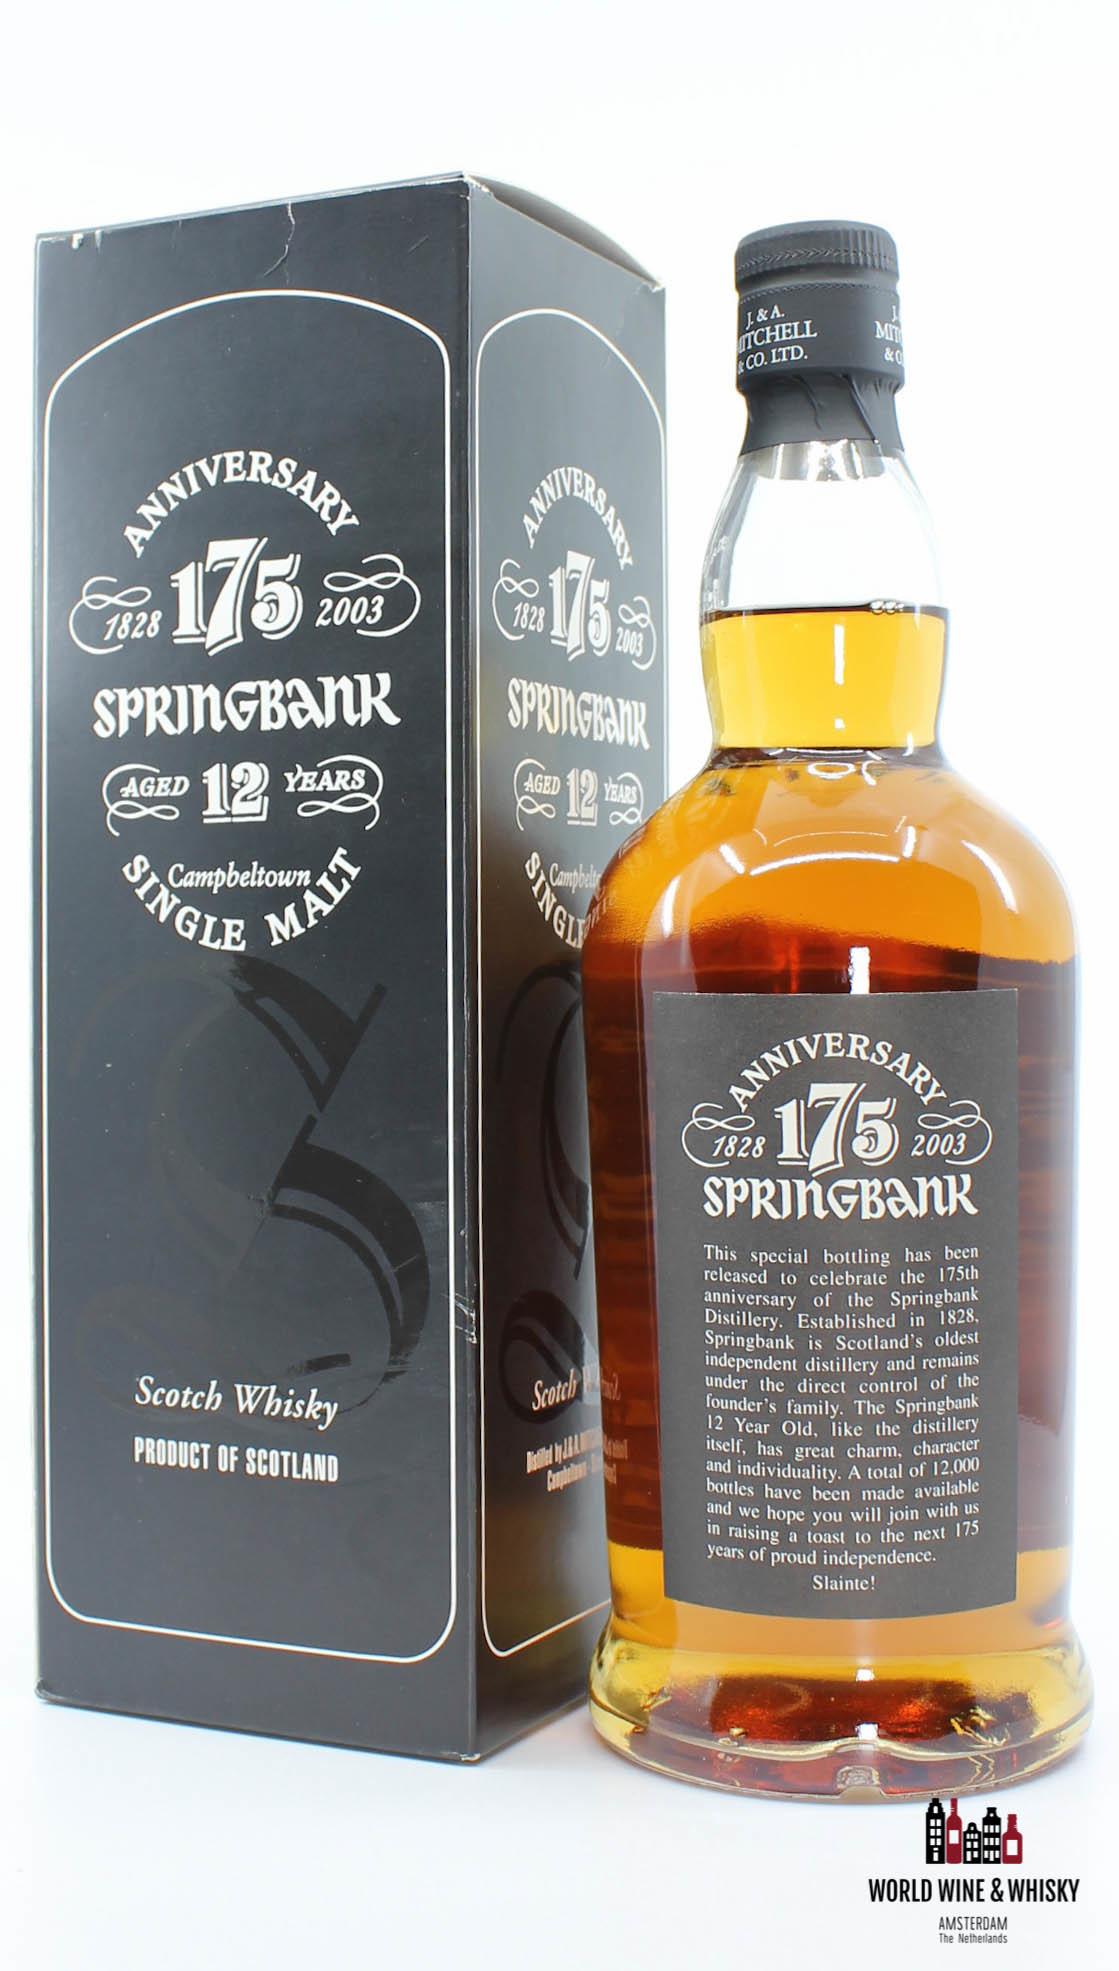 Springbank Springbank 12 Years Old 175th Anniversary 1828-2003 46%